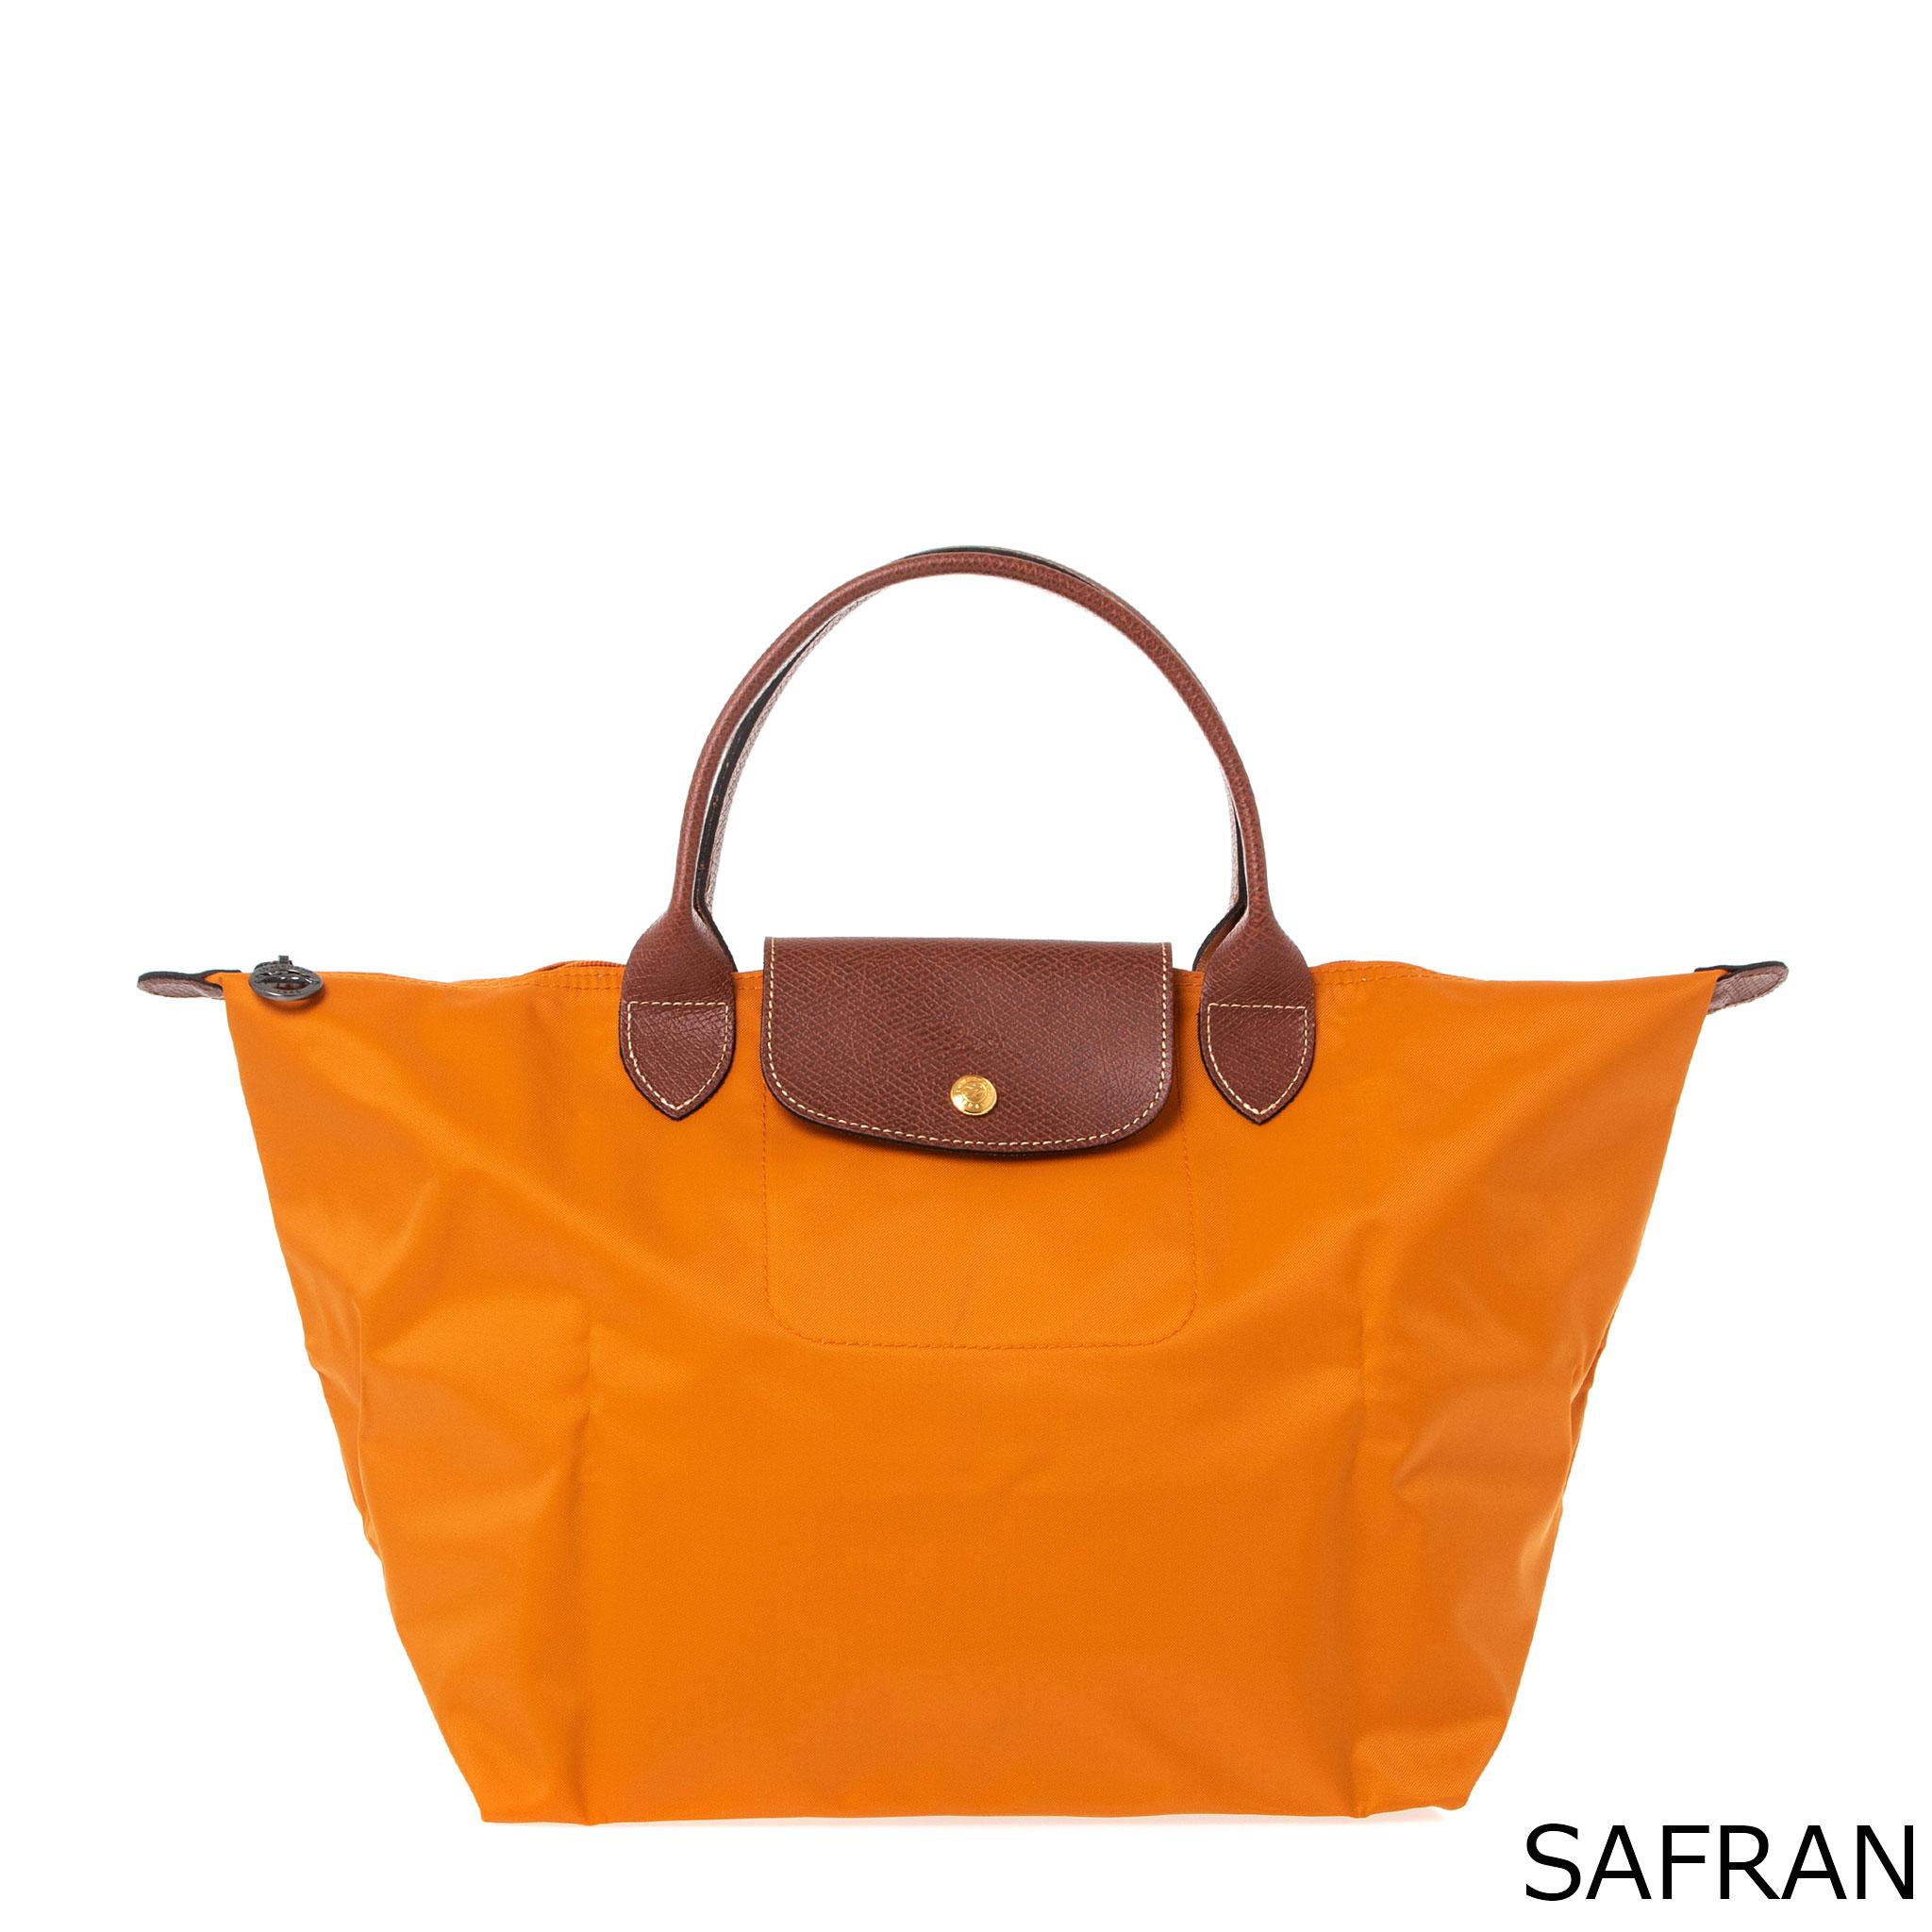 Longchamp tote bags LE PLIAGE 1623 089 LONGCHAMP